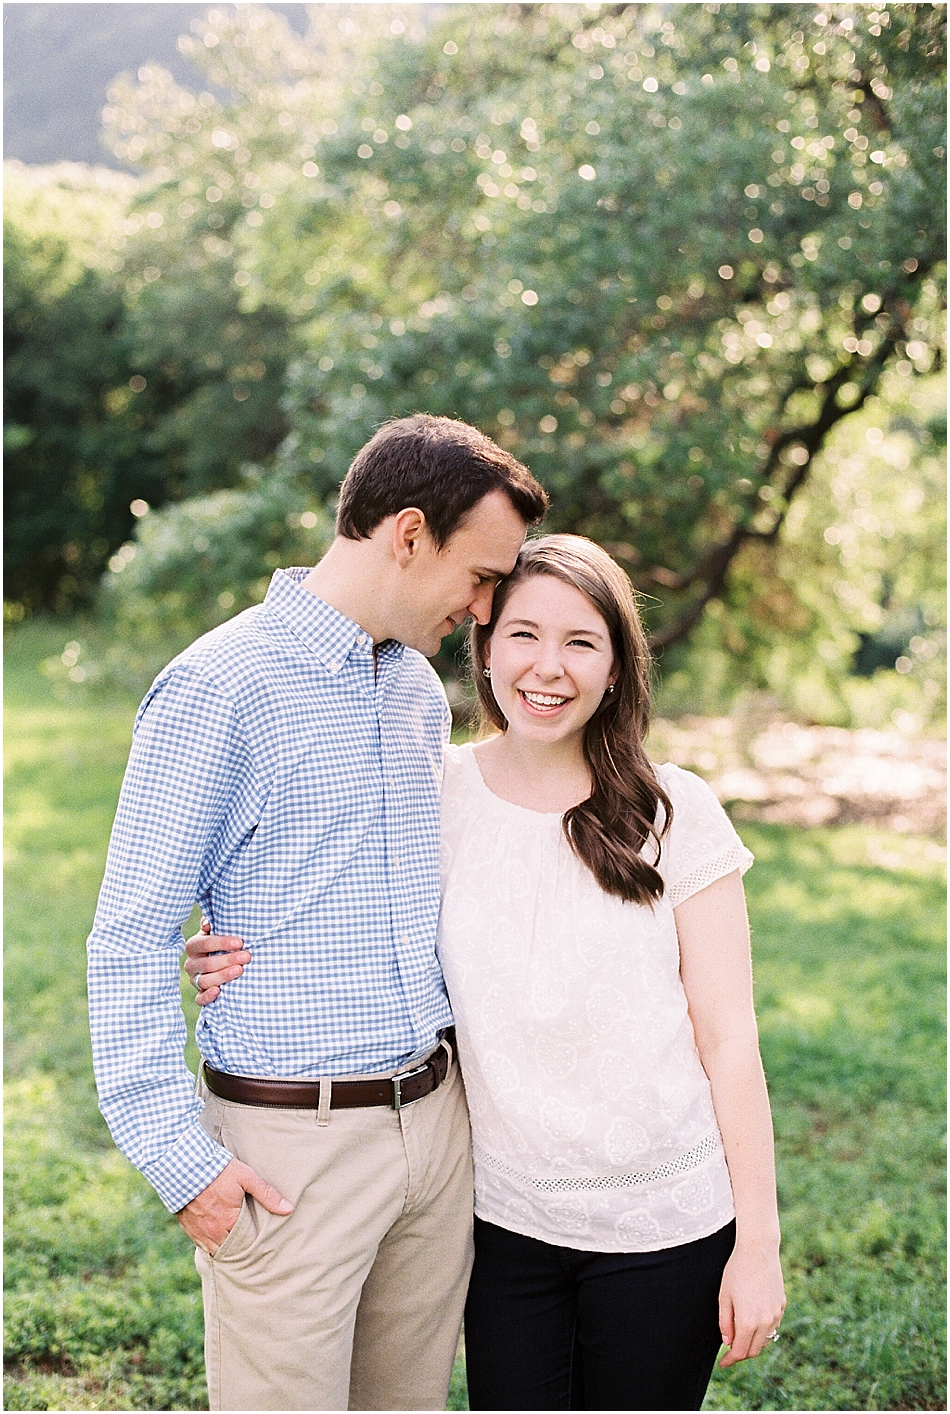 Laura + Nick | Engagement | Fine Art Film | Austin Texas | Emilie Anne Photography-9.jpg